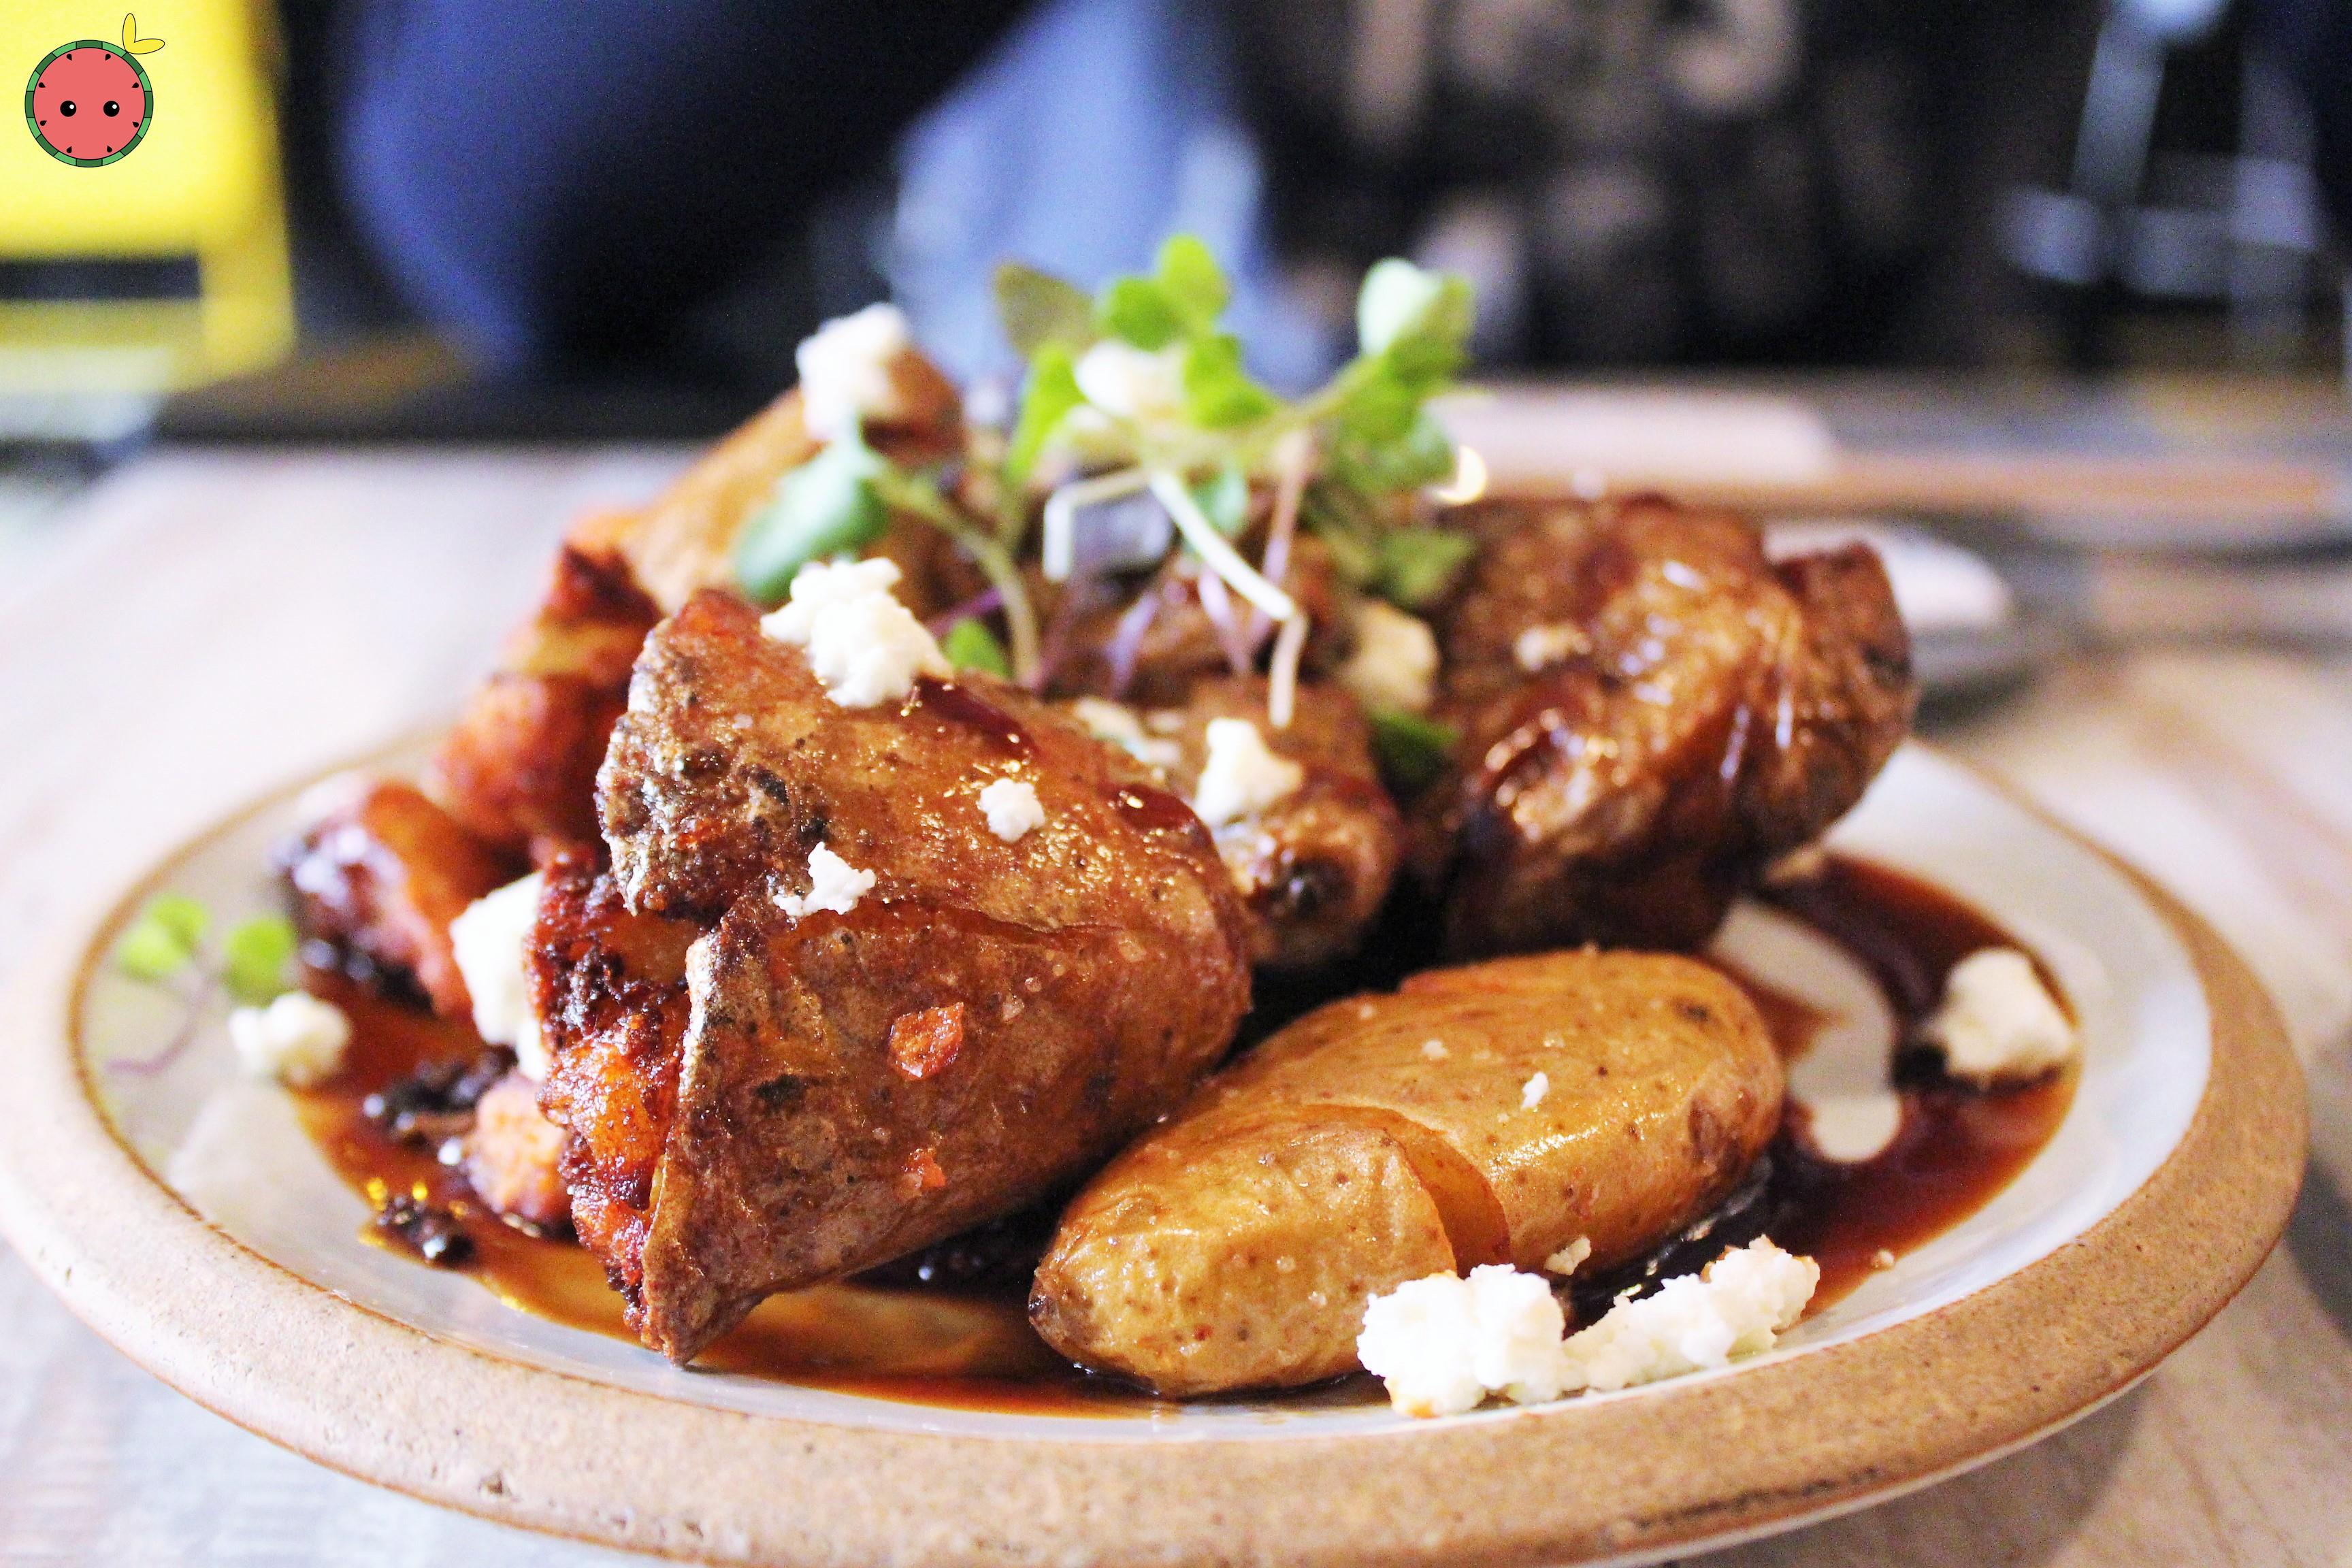 Ugly Potato - Crispy fingerling potato and feta cheese topped with smokey BBQ sauce (2)